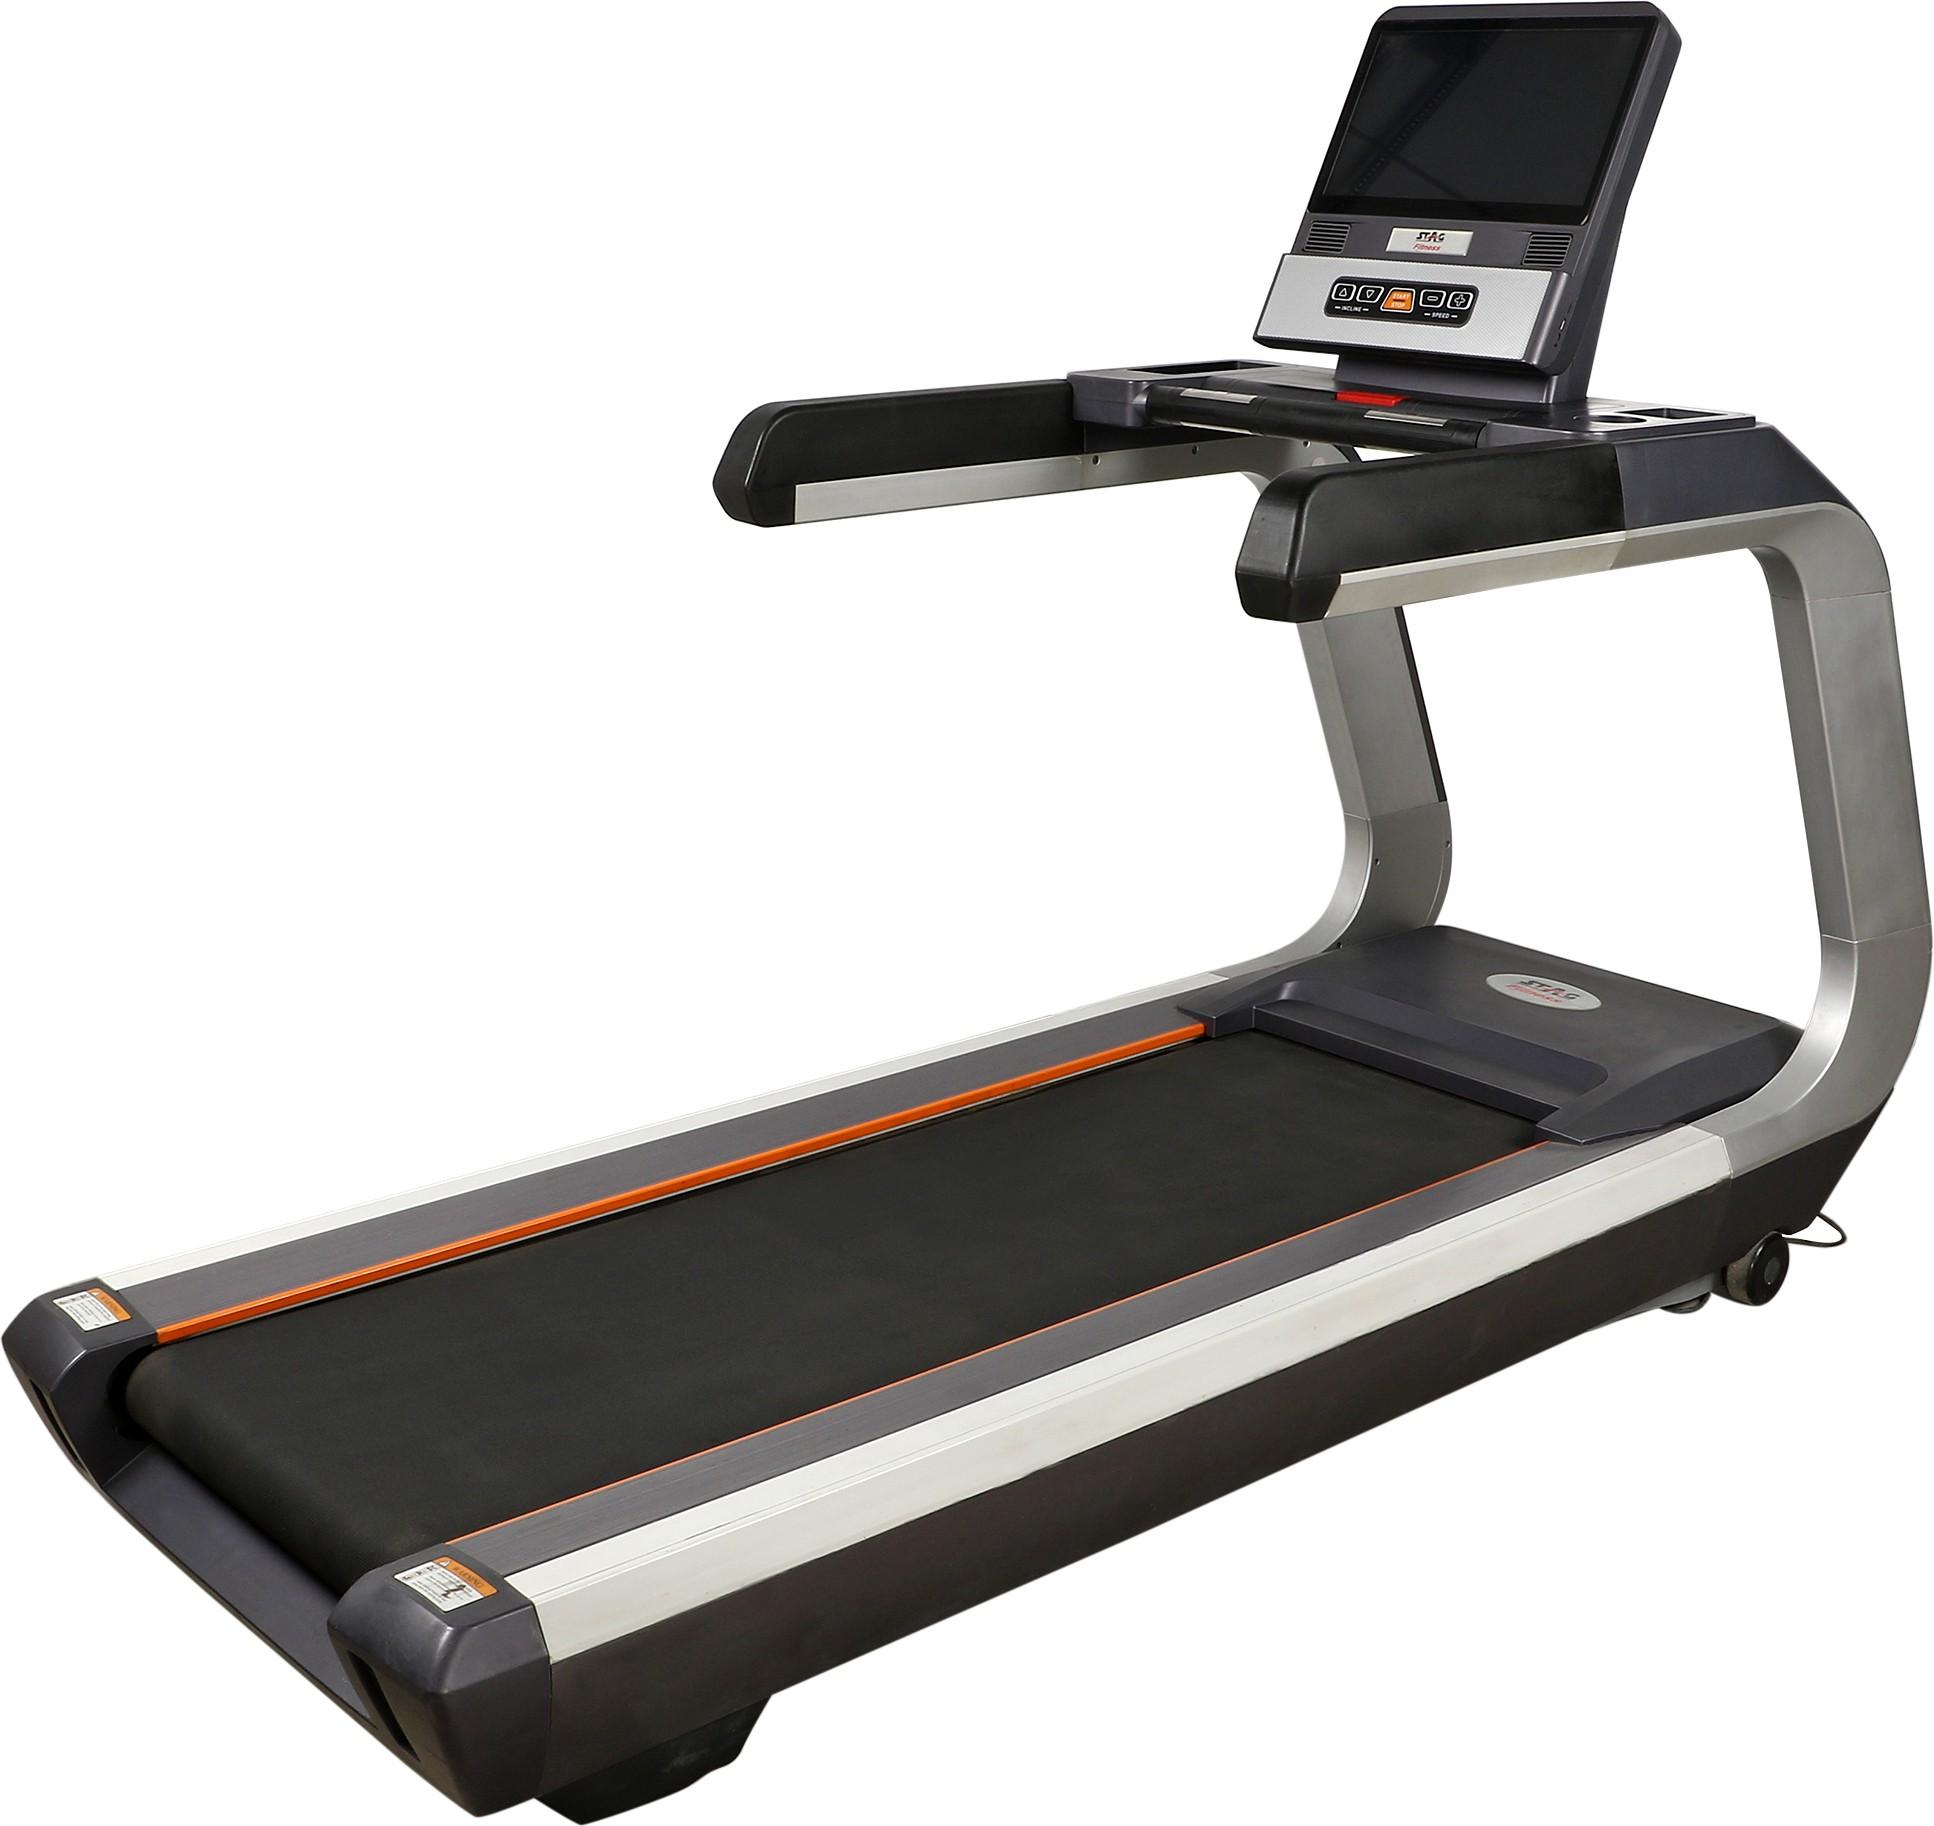 Cybex Treadmill 750t Price In India: Stag CommercialSTZ7000 Treadmill Best Price In India As On